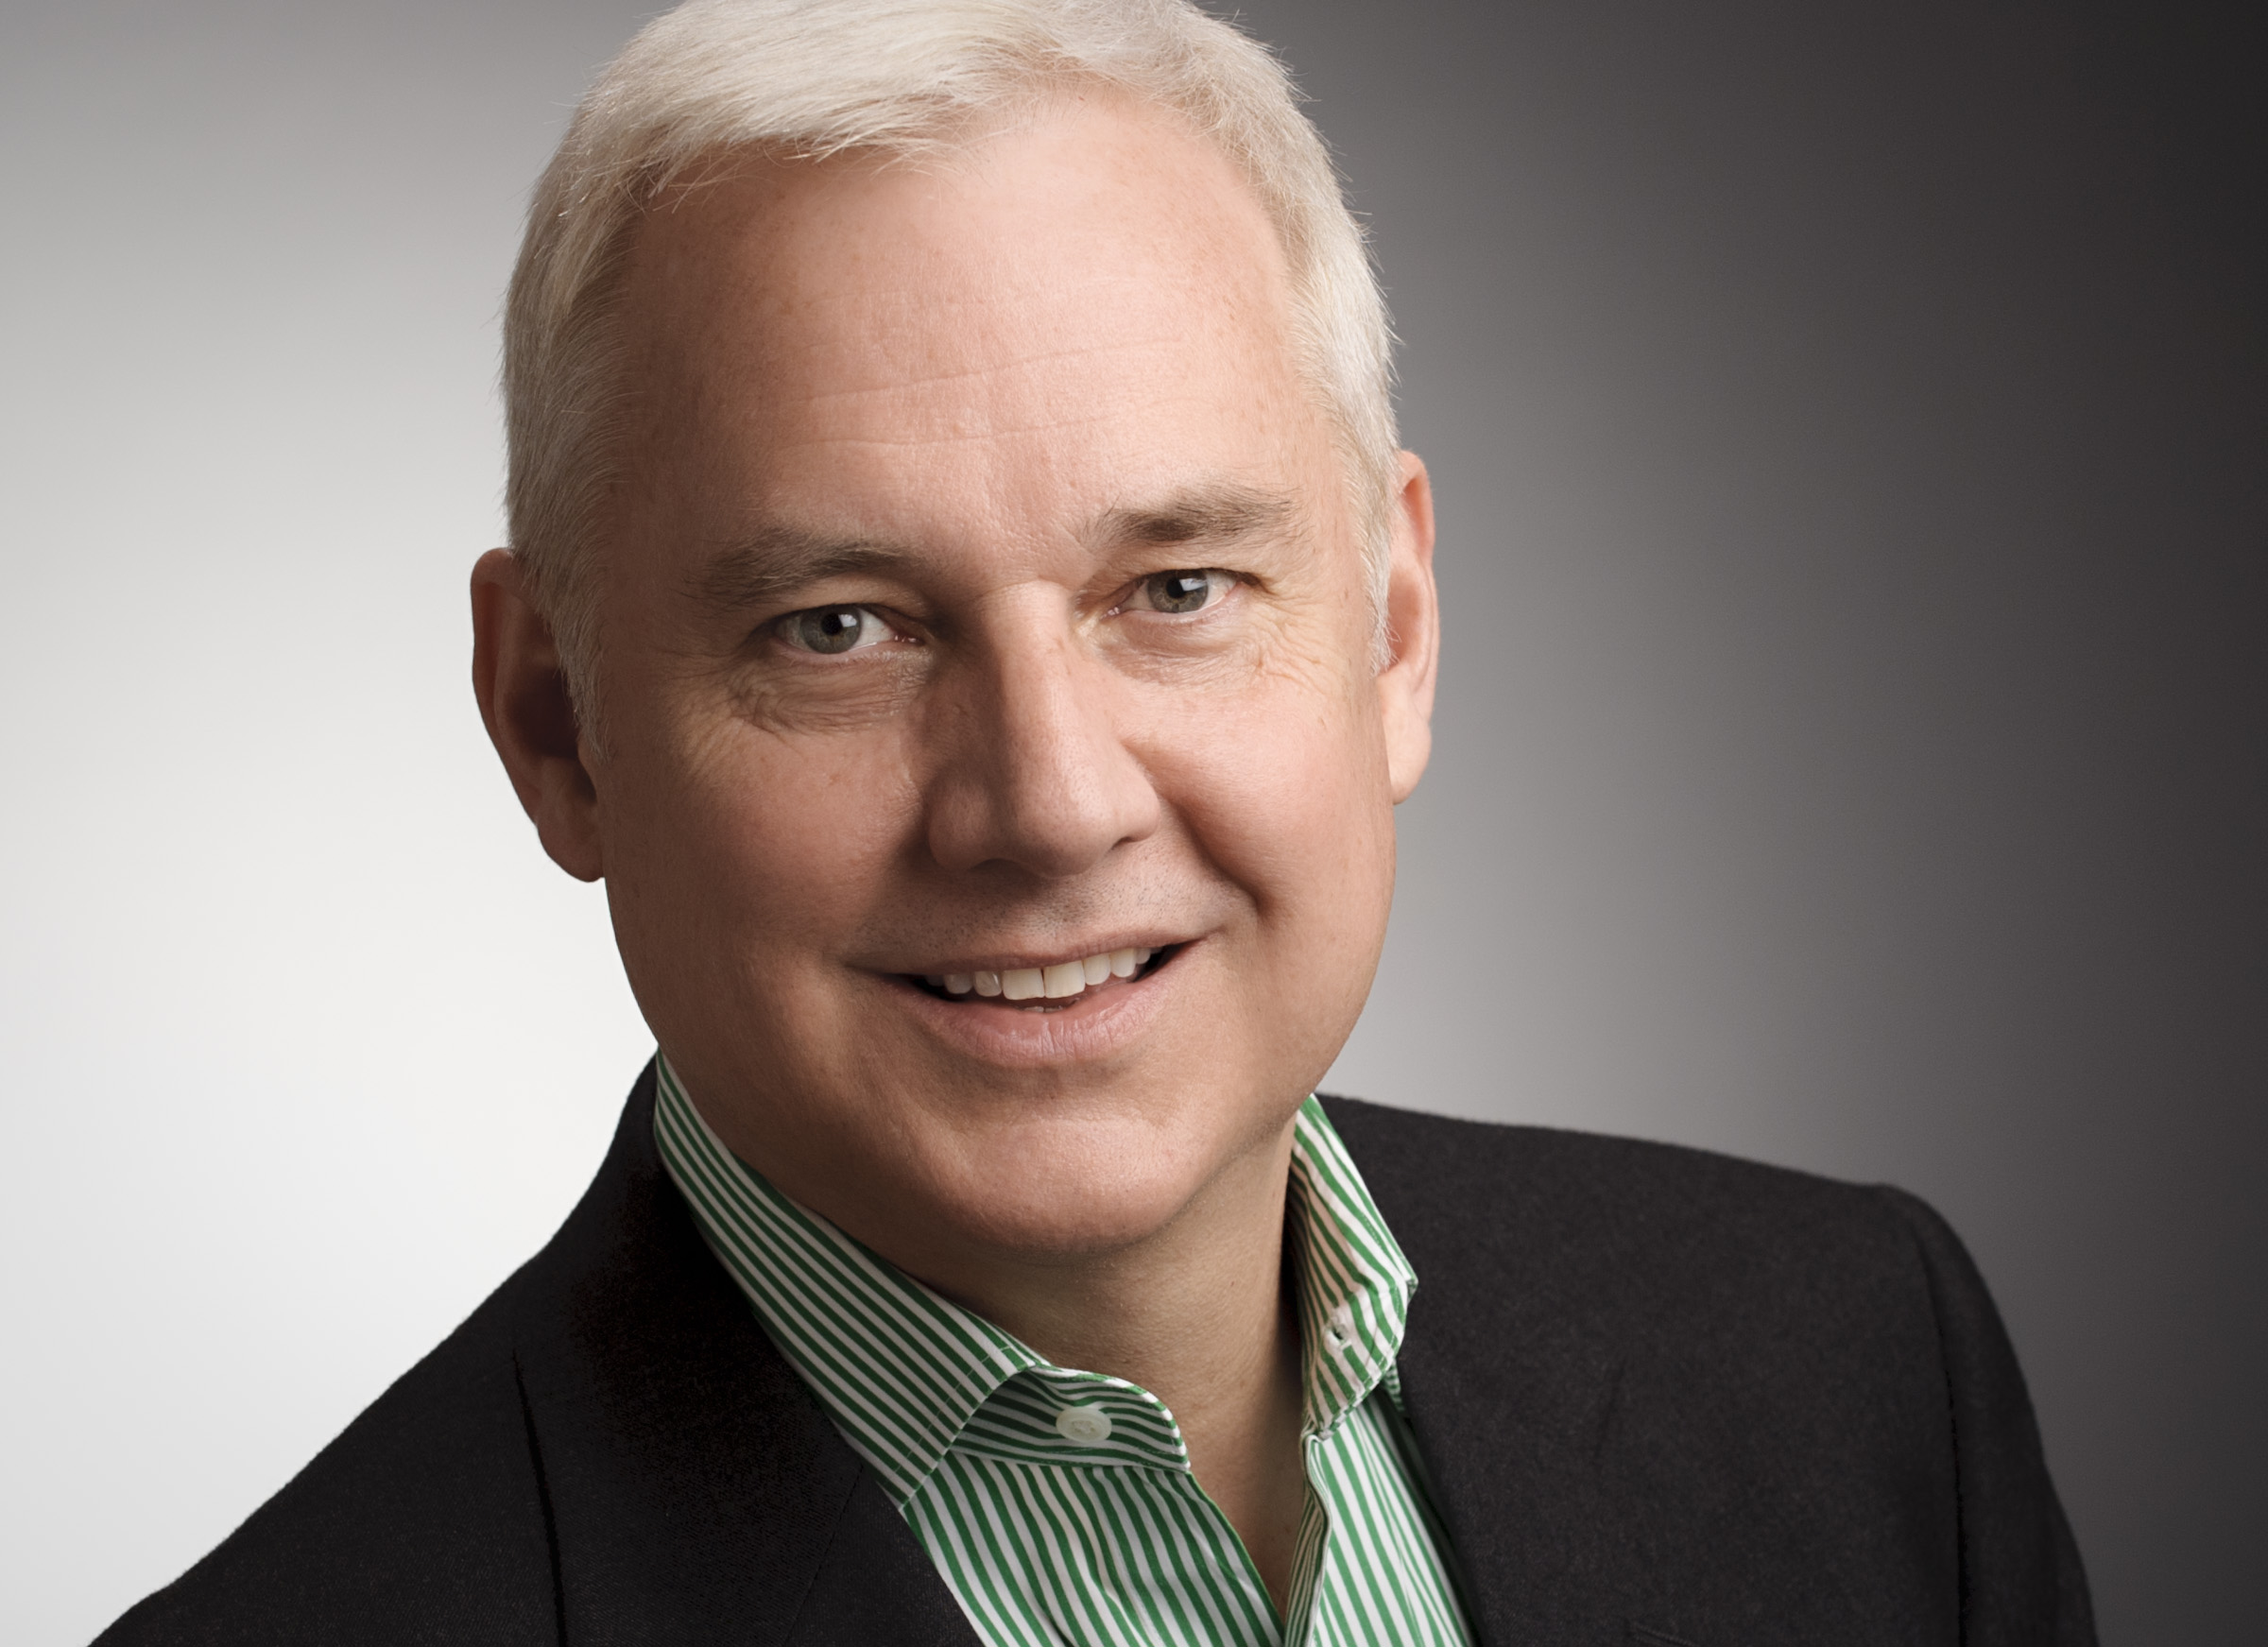 Host mark johnson faia kbtribechat for Certified professional building designer